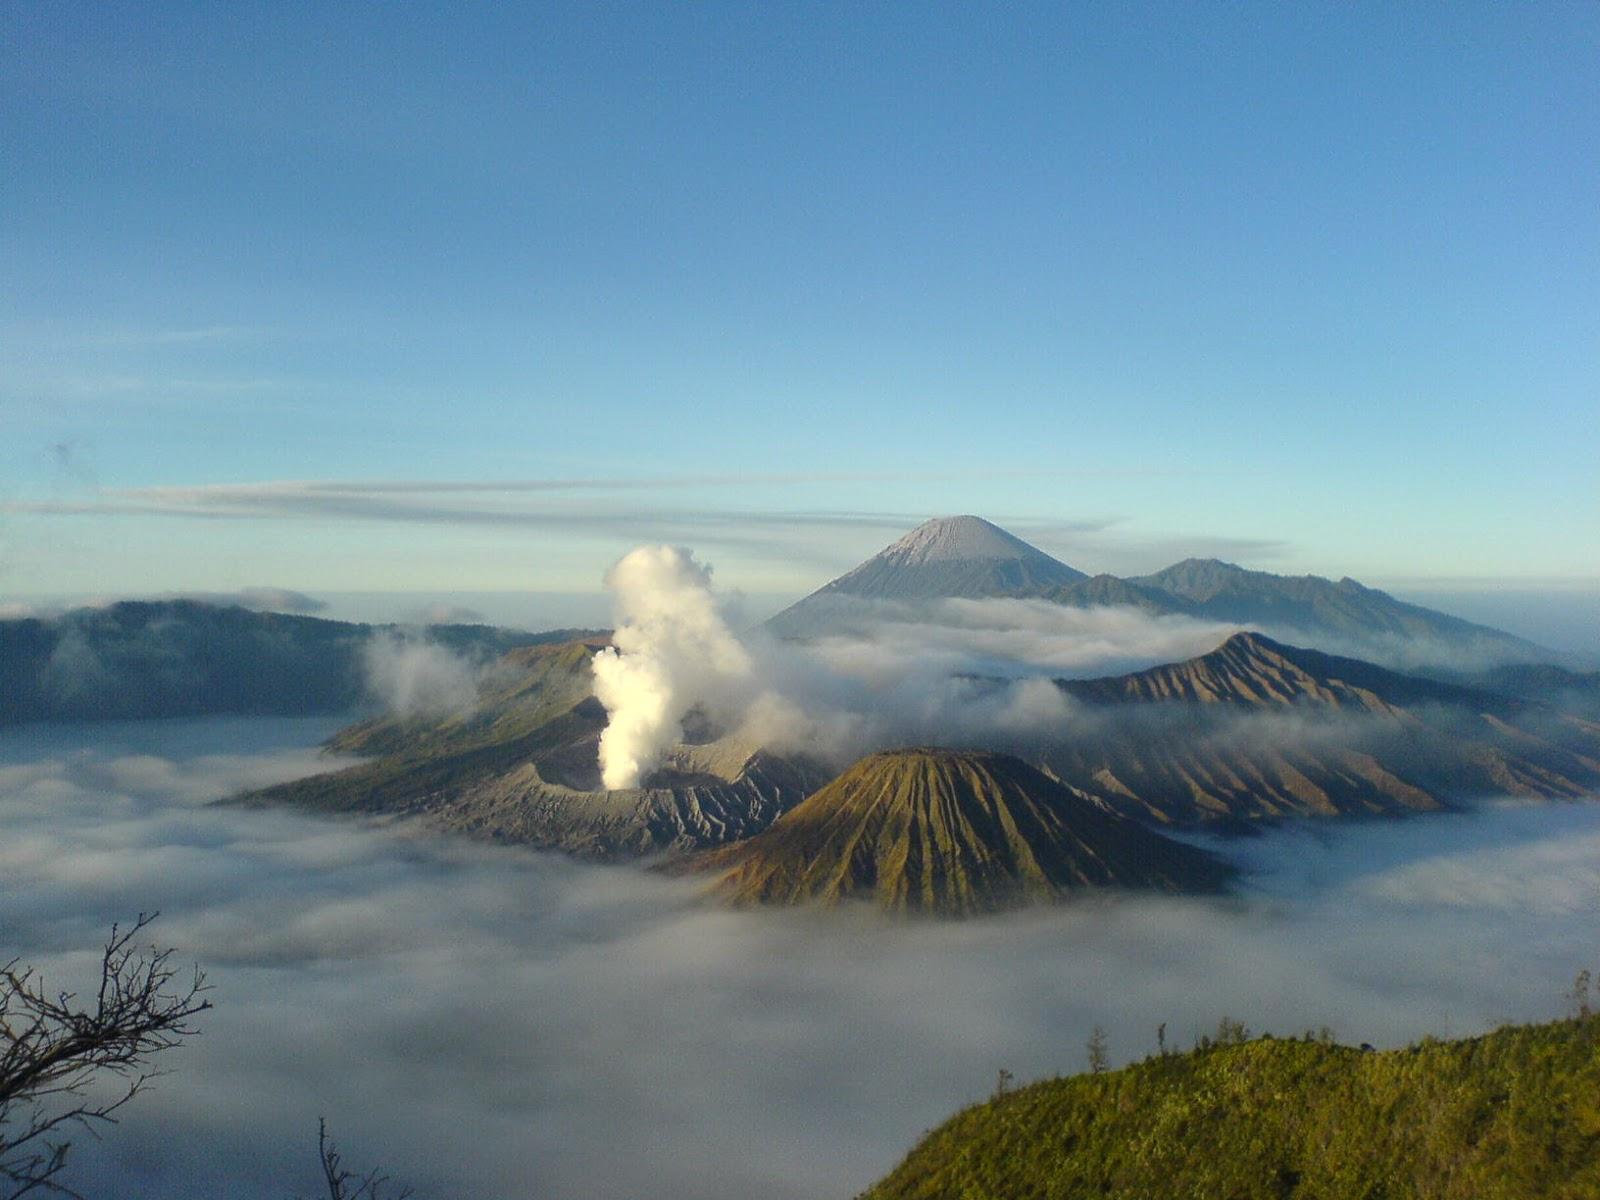 Probolinggo Indonesia  city photos gallery : Gunung Bromo bukan hanya dikenal oleh masyarakat Indonesia, tetapi ...